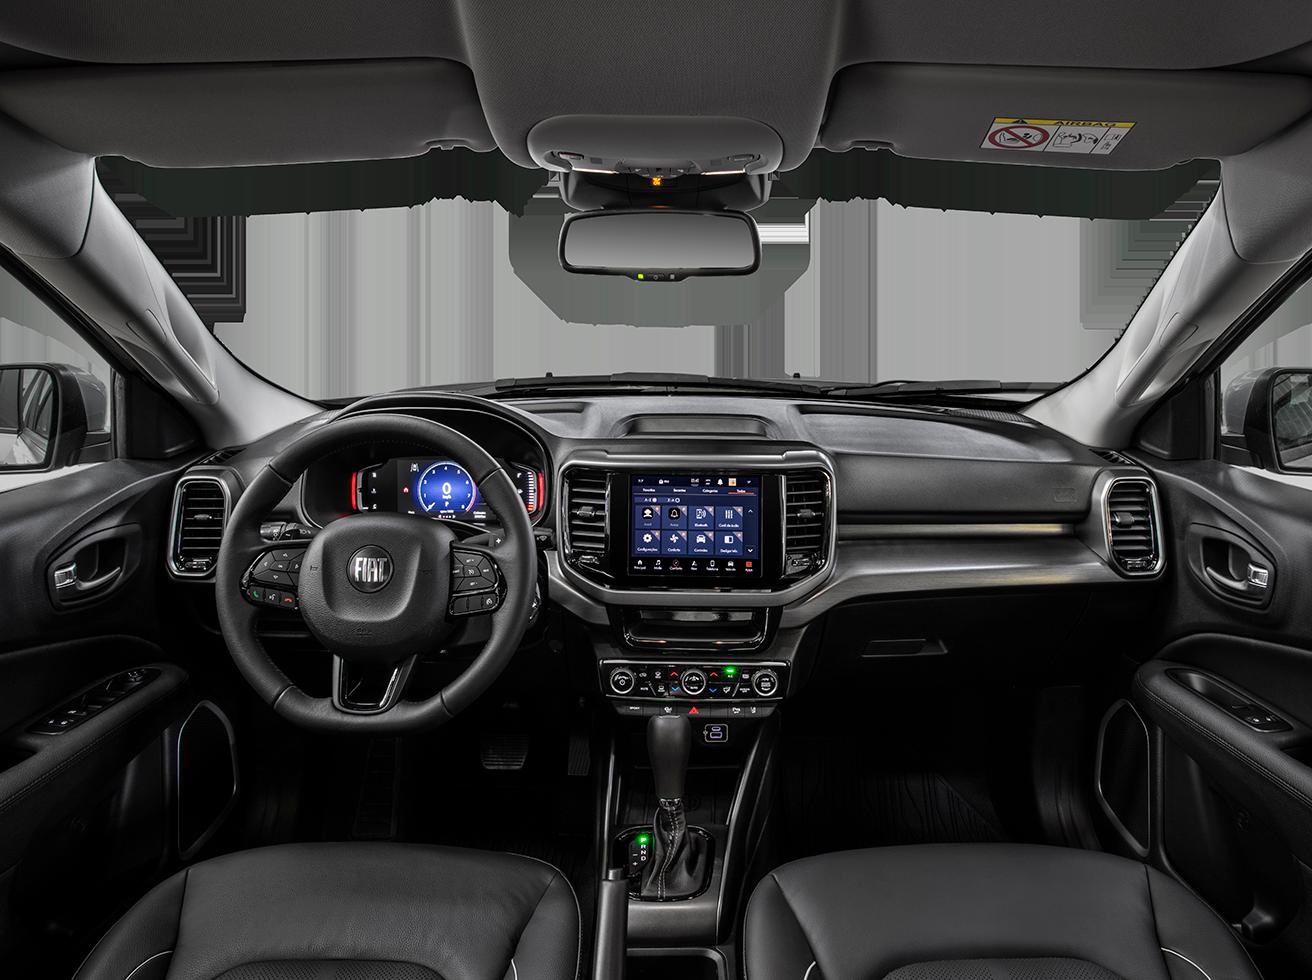 2.0 16V TURBO DIESEL FREEDOM 4WD AT9